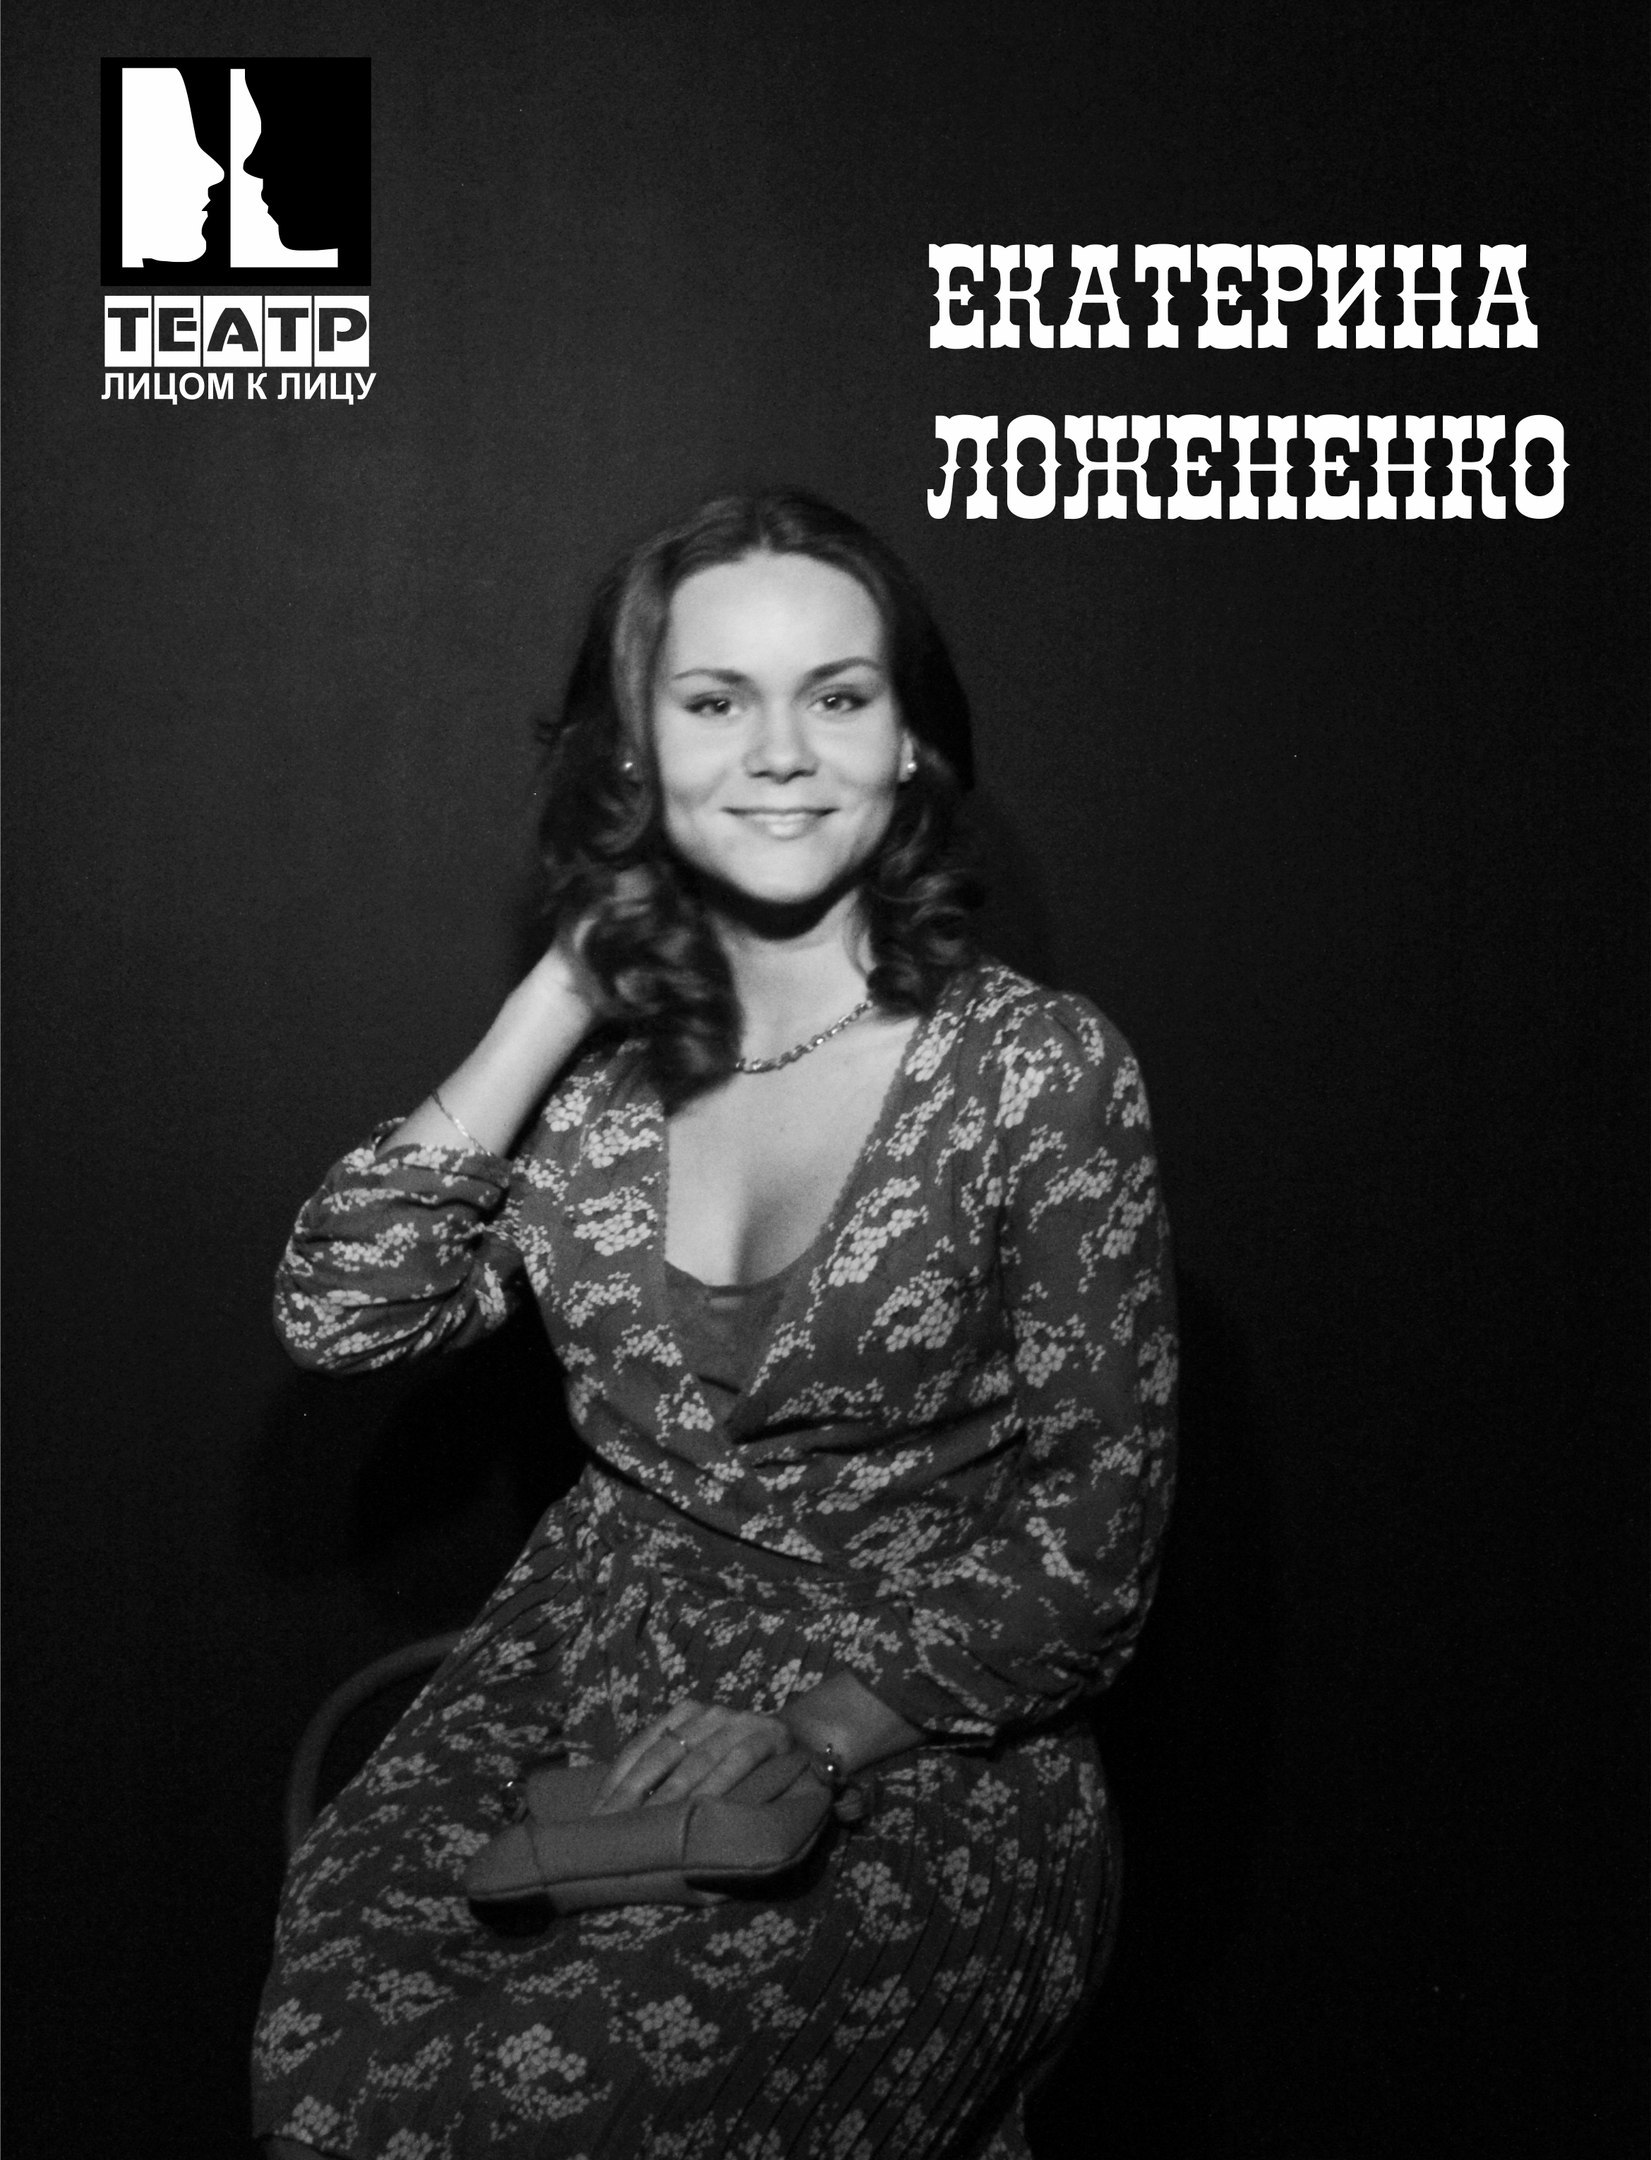 Екатерига Ложененко